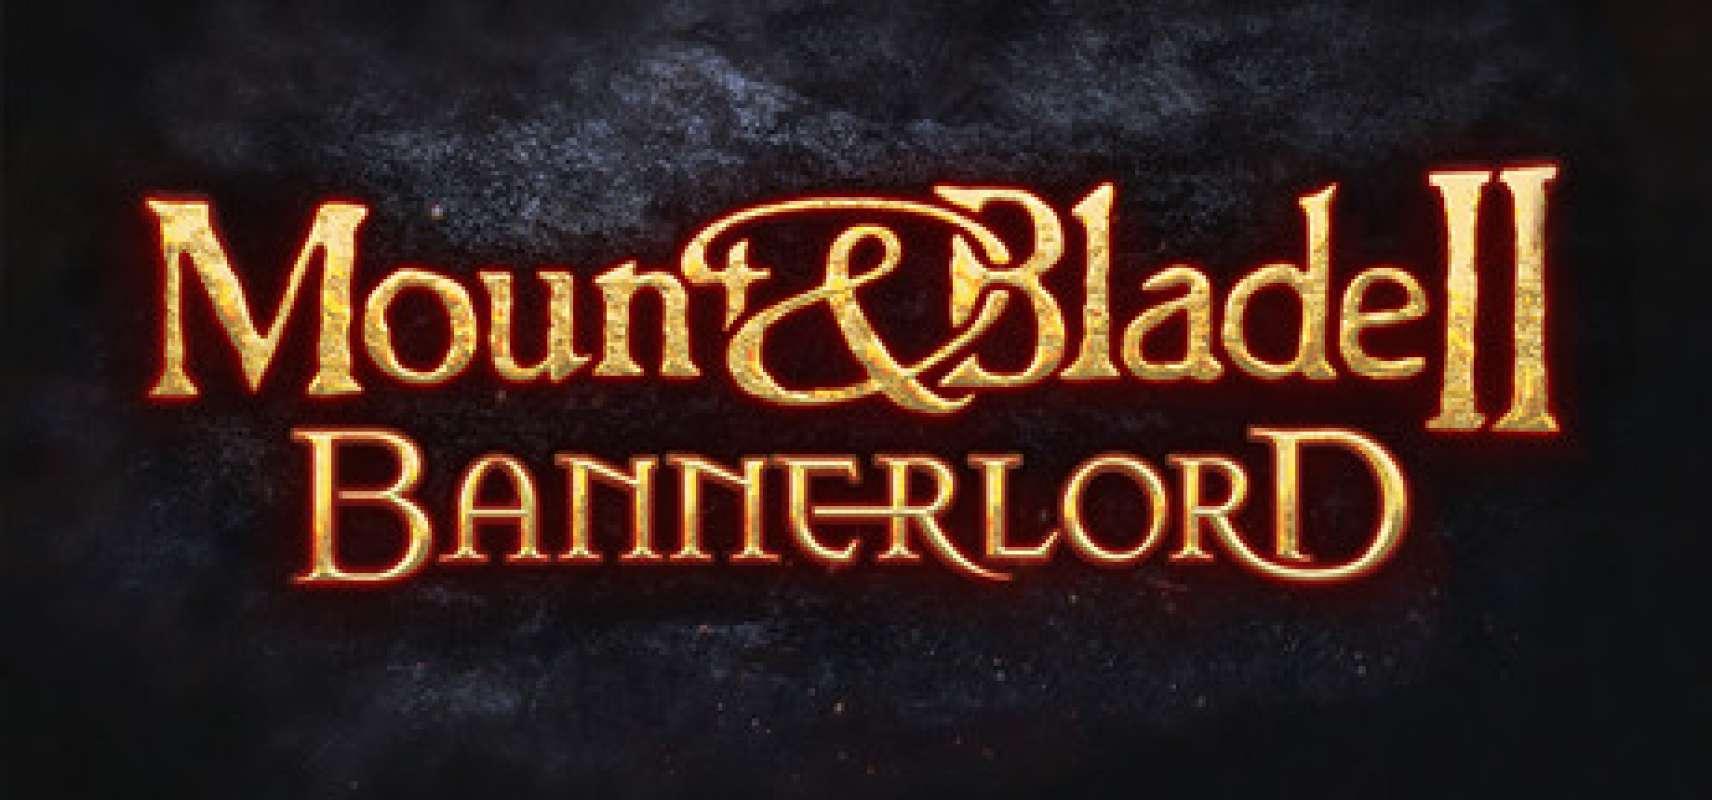 Mount&Blade II: Bannerlord (Ожидаем)